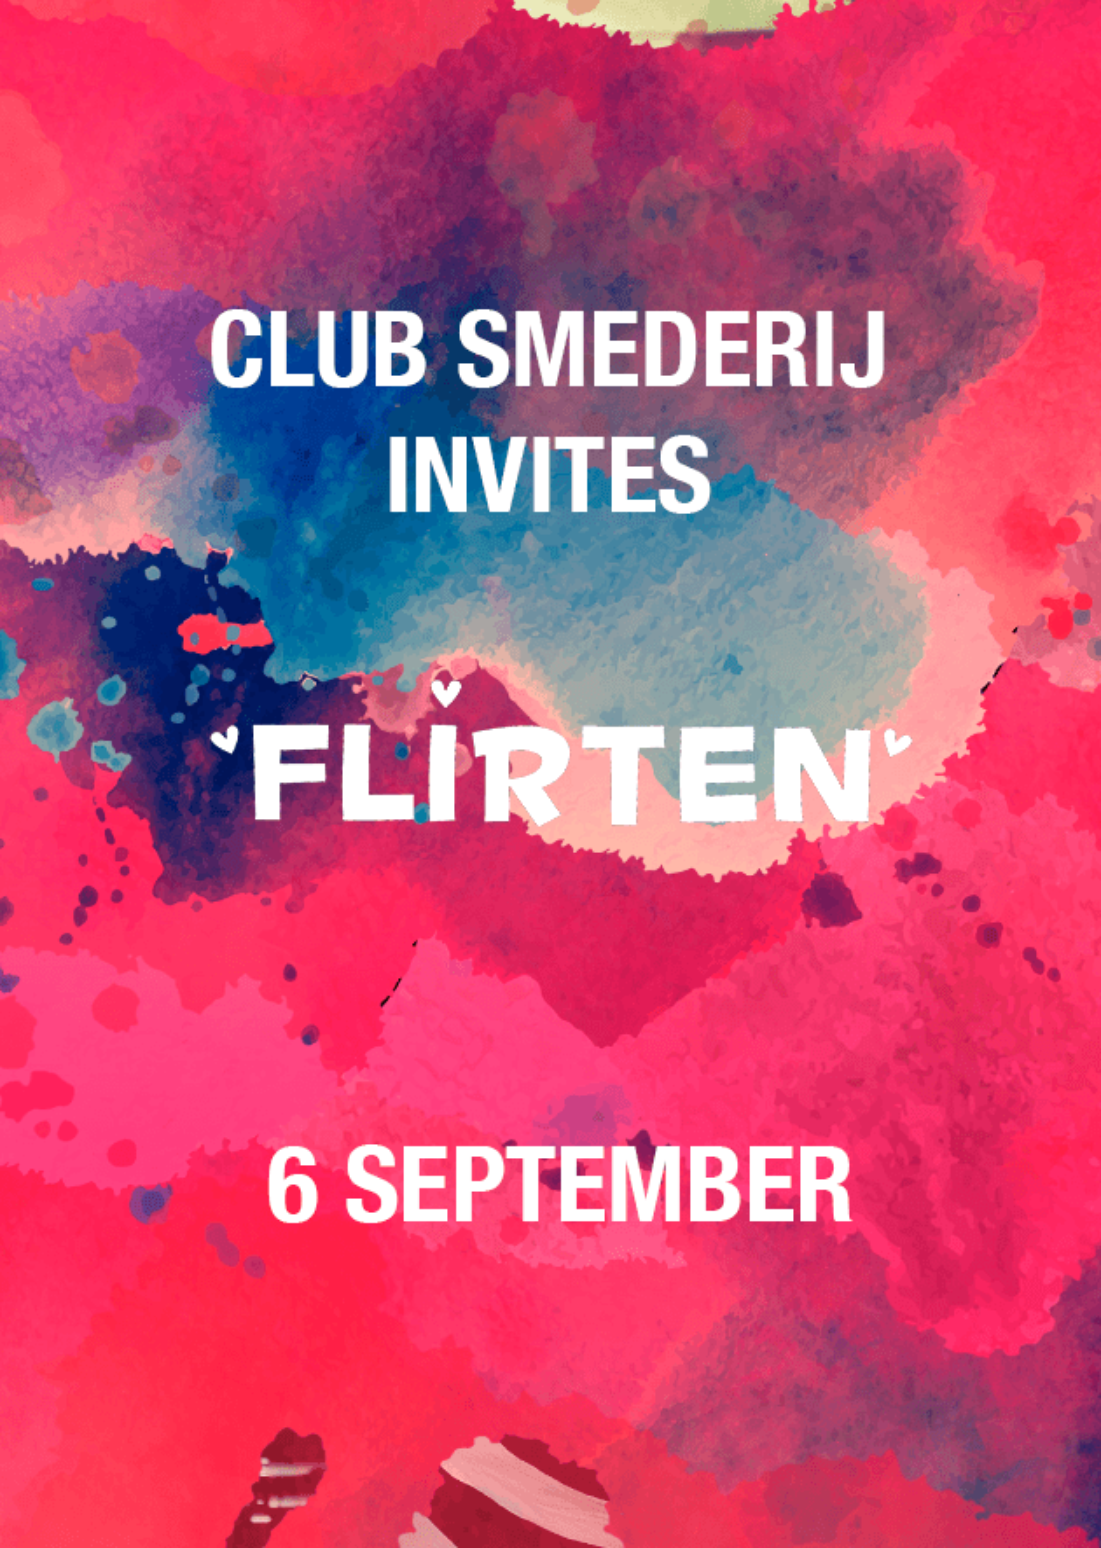 Club Smederij Invites FLIRTEN